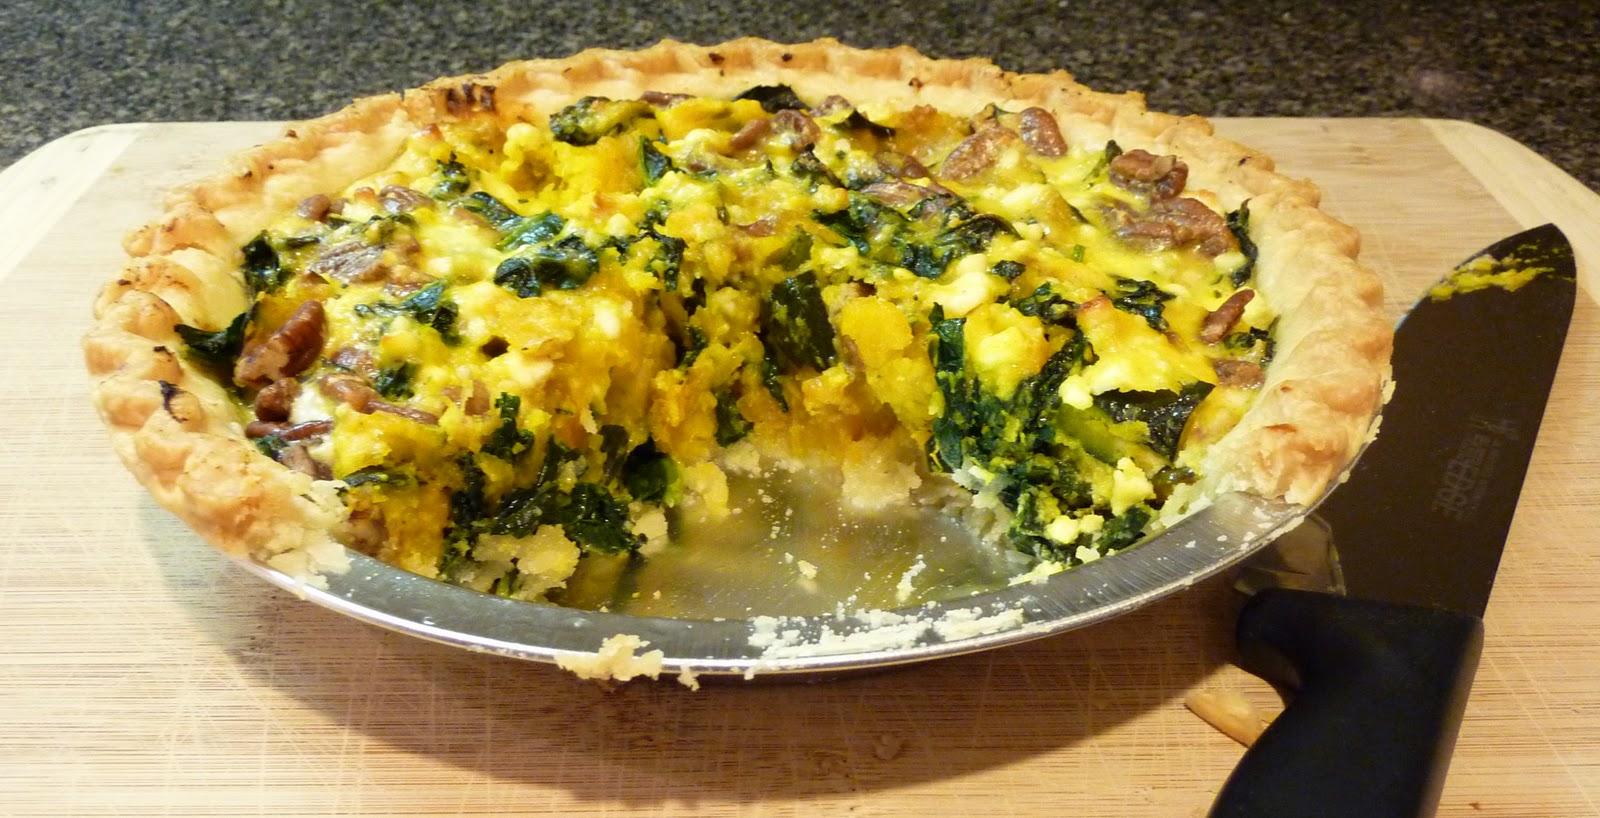 Simple Plates: Roasted Squash and Kale Tart